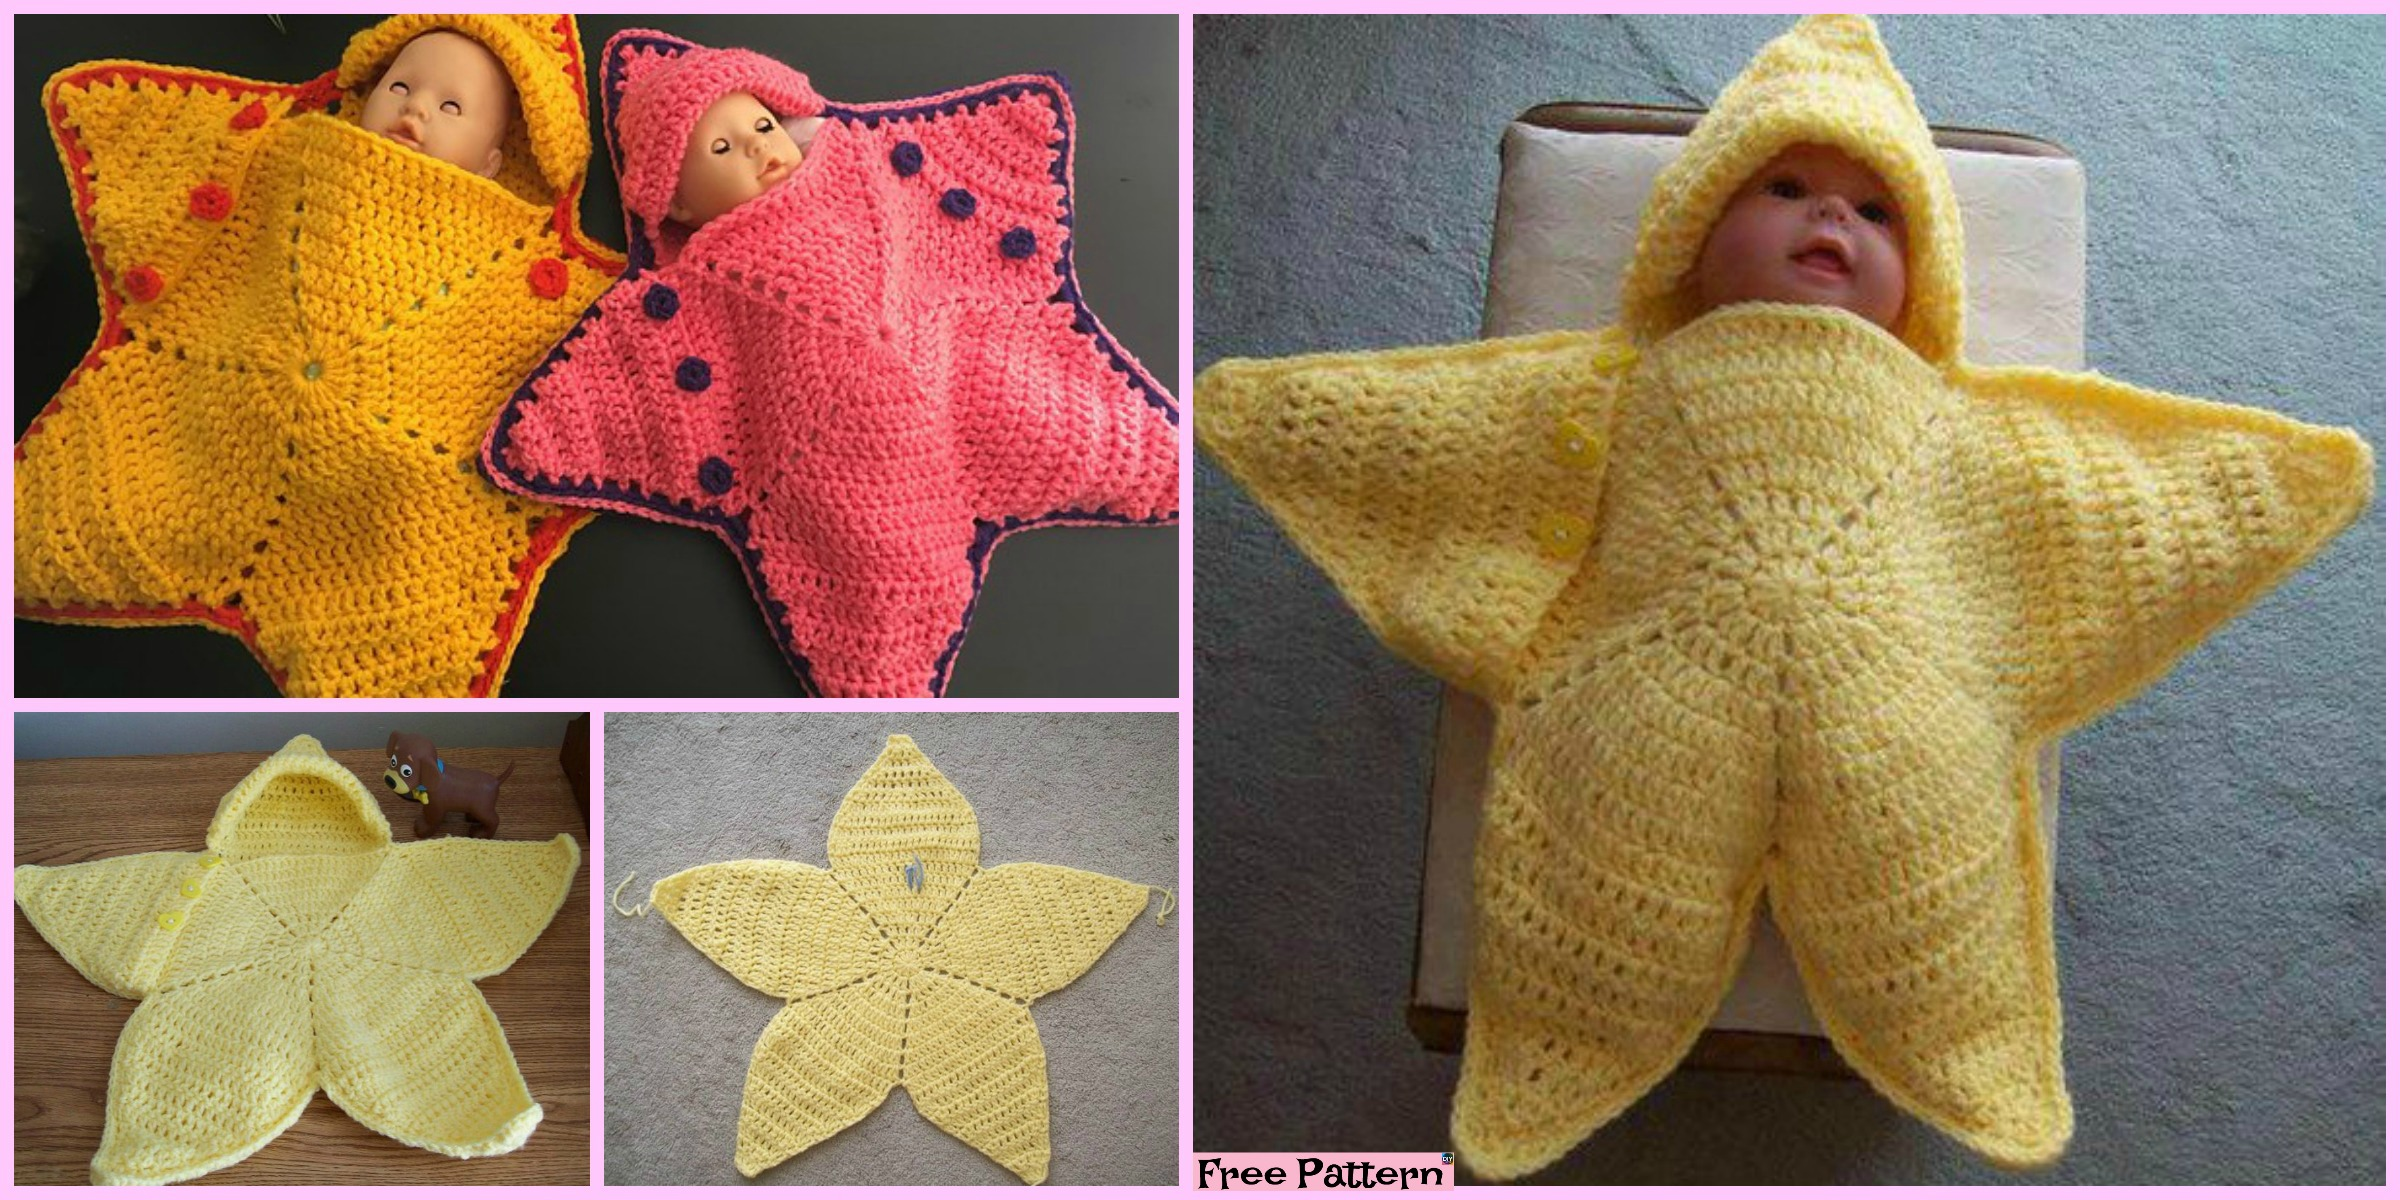 Cute Crochet Baby Star Bunting – Free Pattern